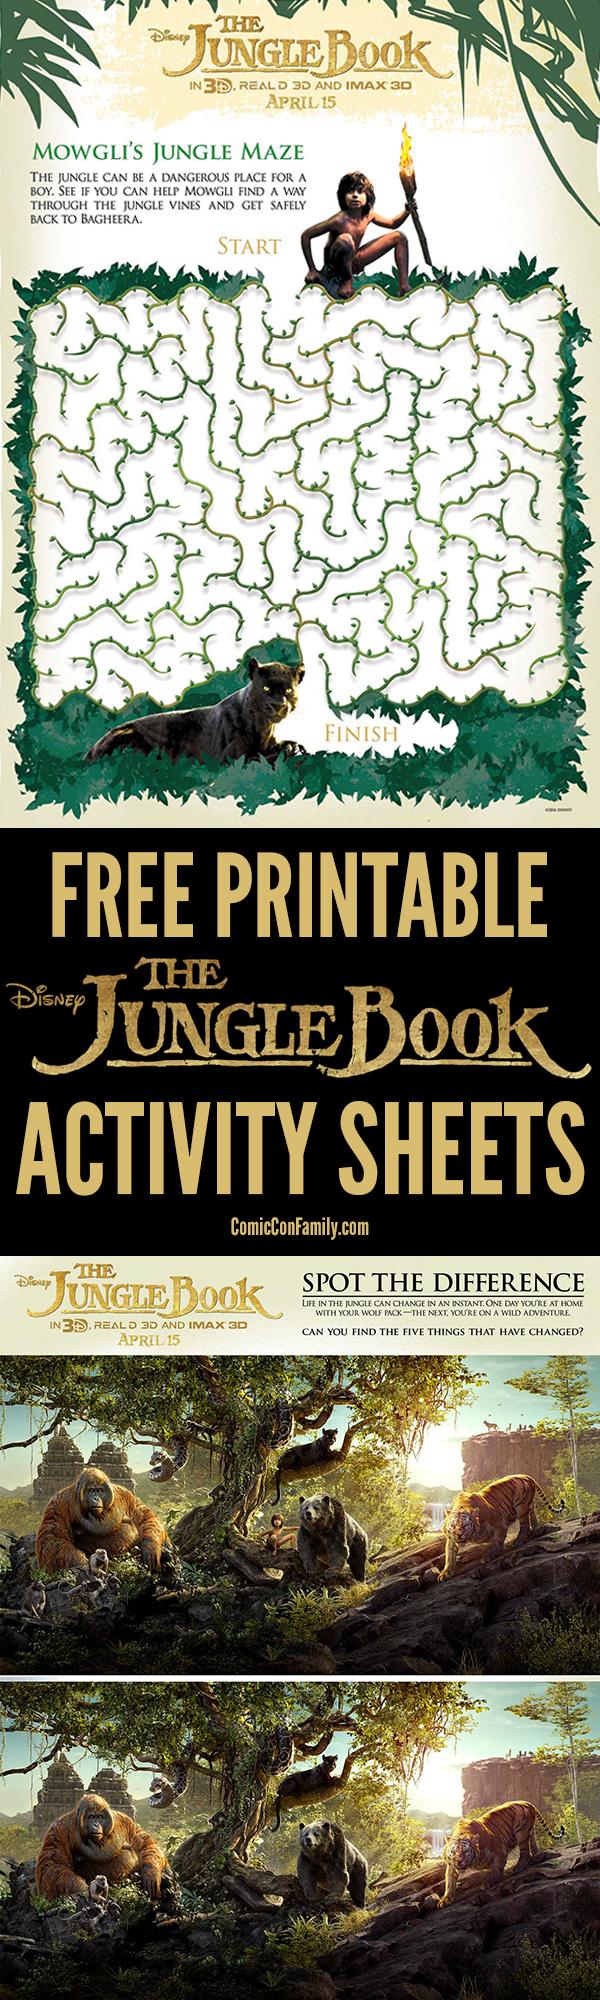 Free Printable Disney The Jungle Book Activity Sheets